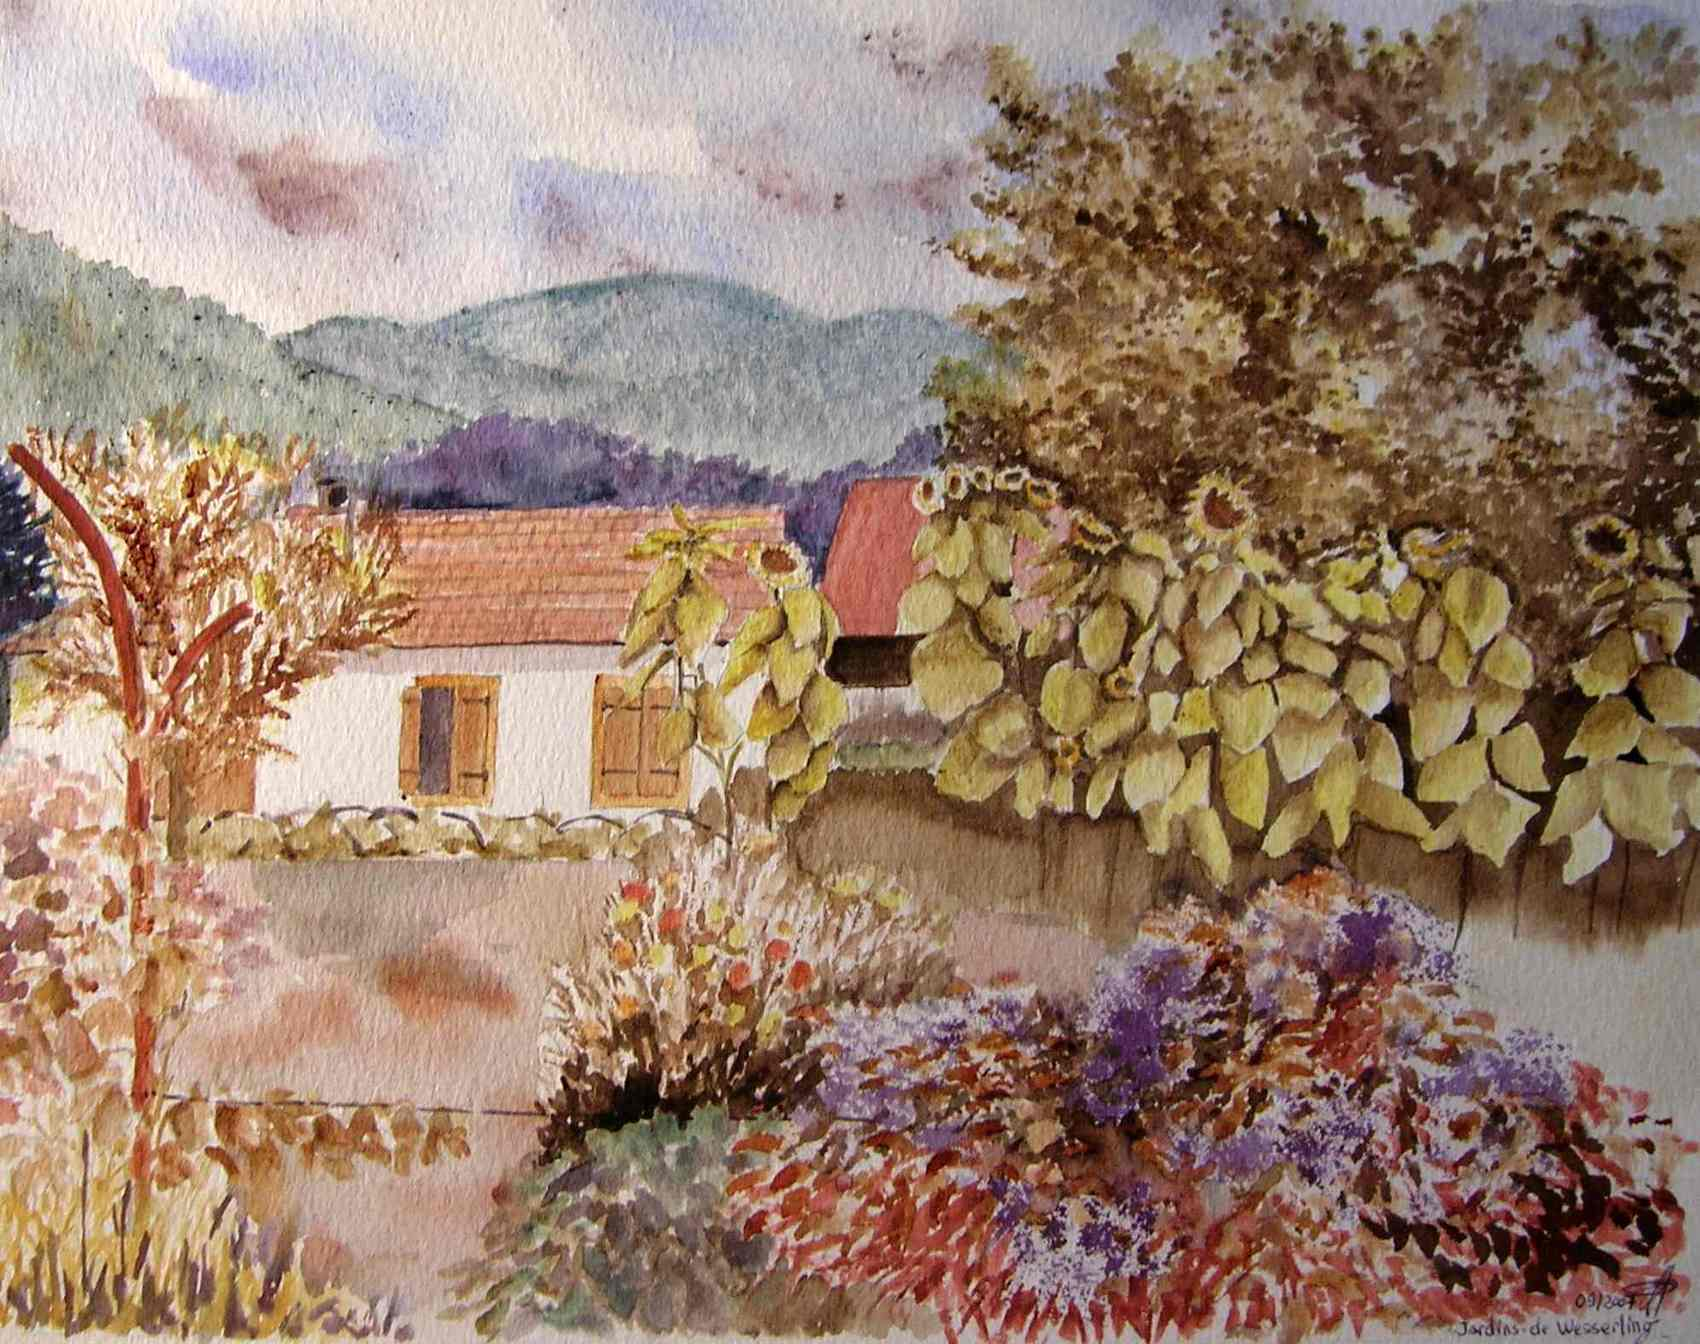 Peinture jardins de wesserling haut rhin for Entretien jardin haut rhin